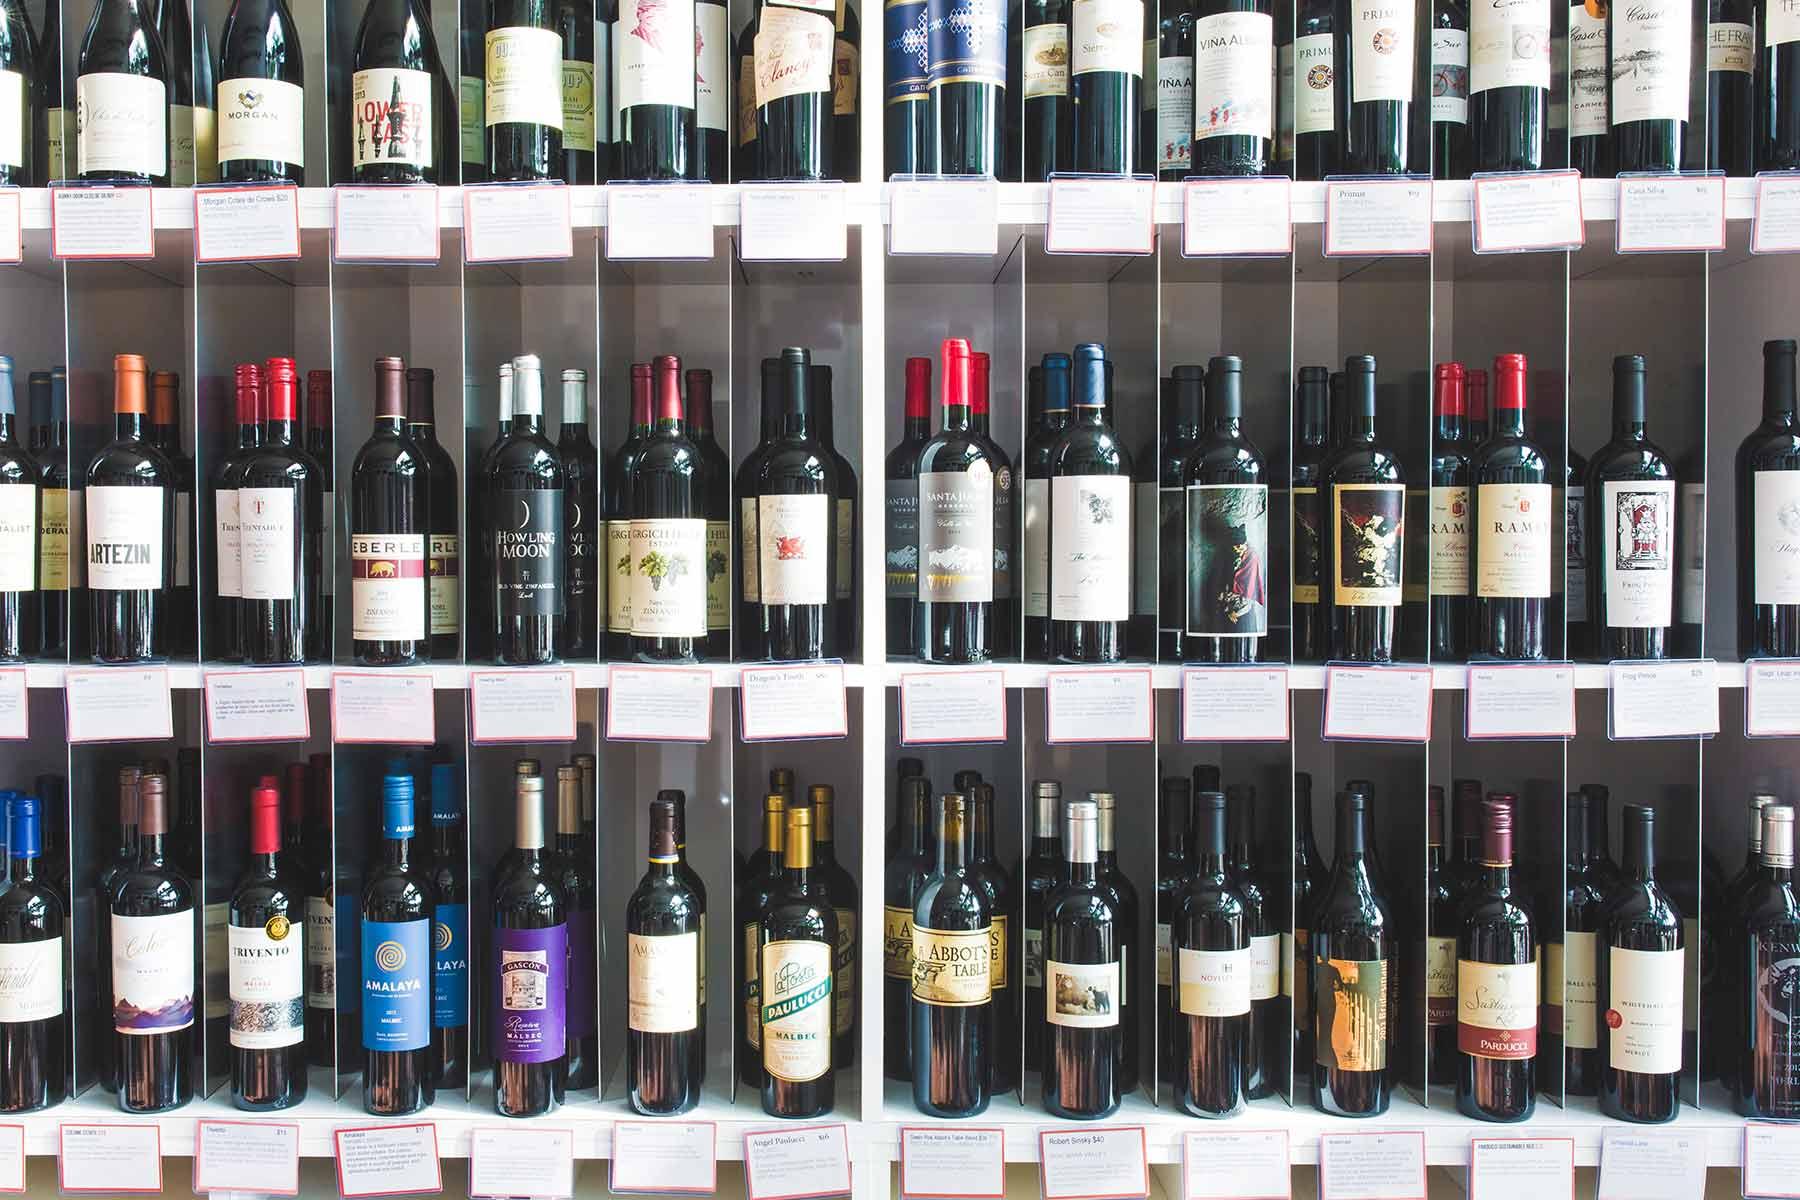 Wine on High wine bottles on shelf